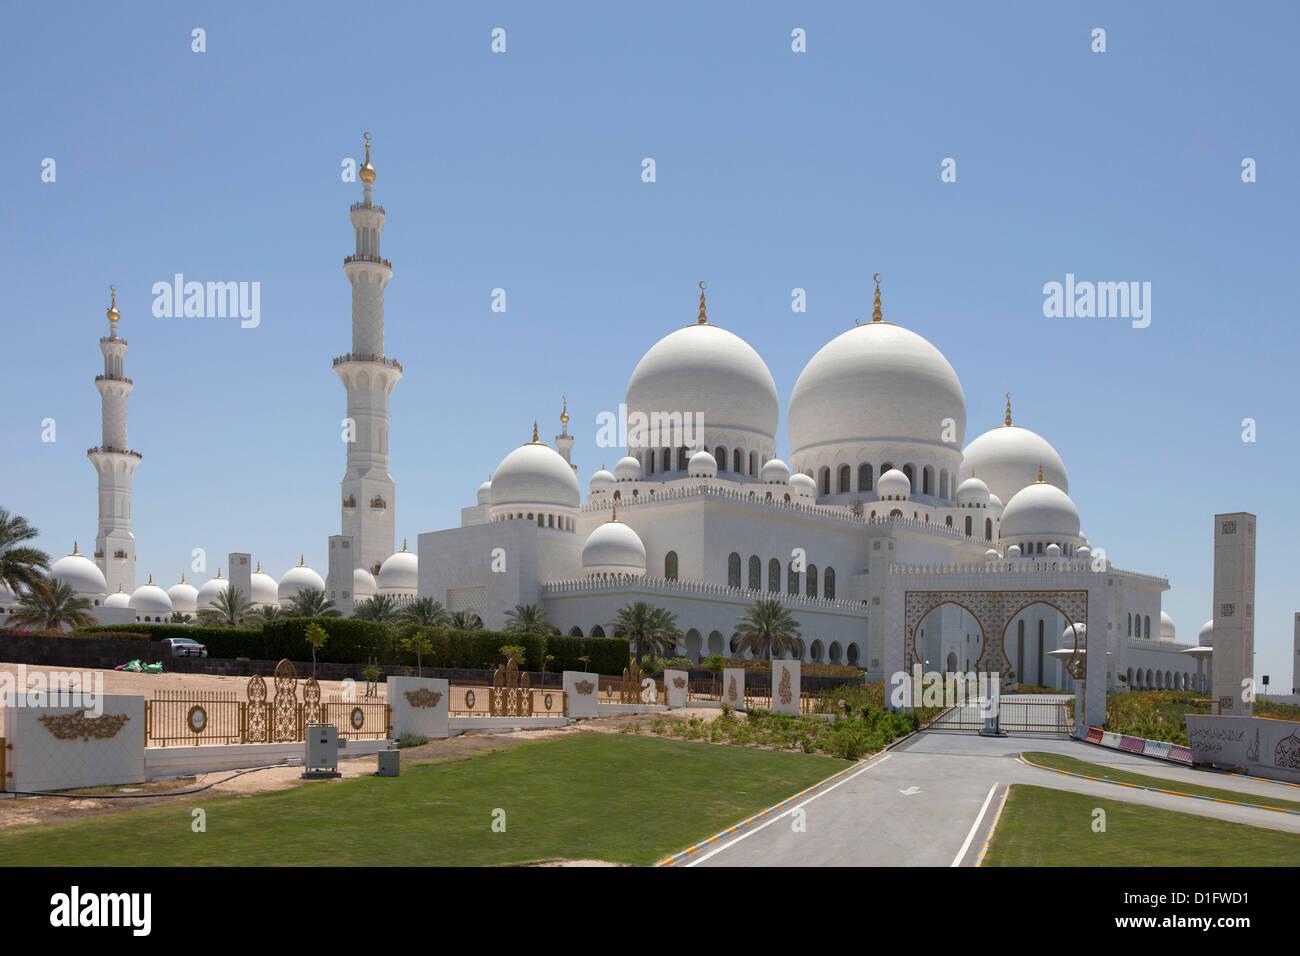 Mezquita Sheikh Zayed, Abu Dhabi, Emiratos Árabes Unidos, Oriente Medio Imagen De Stock